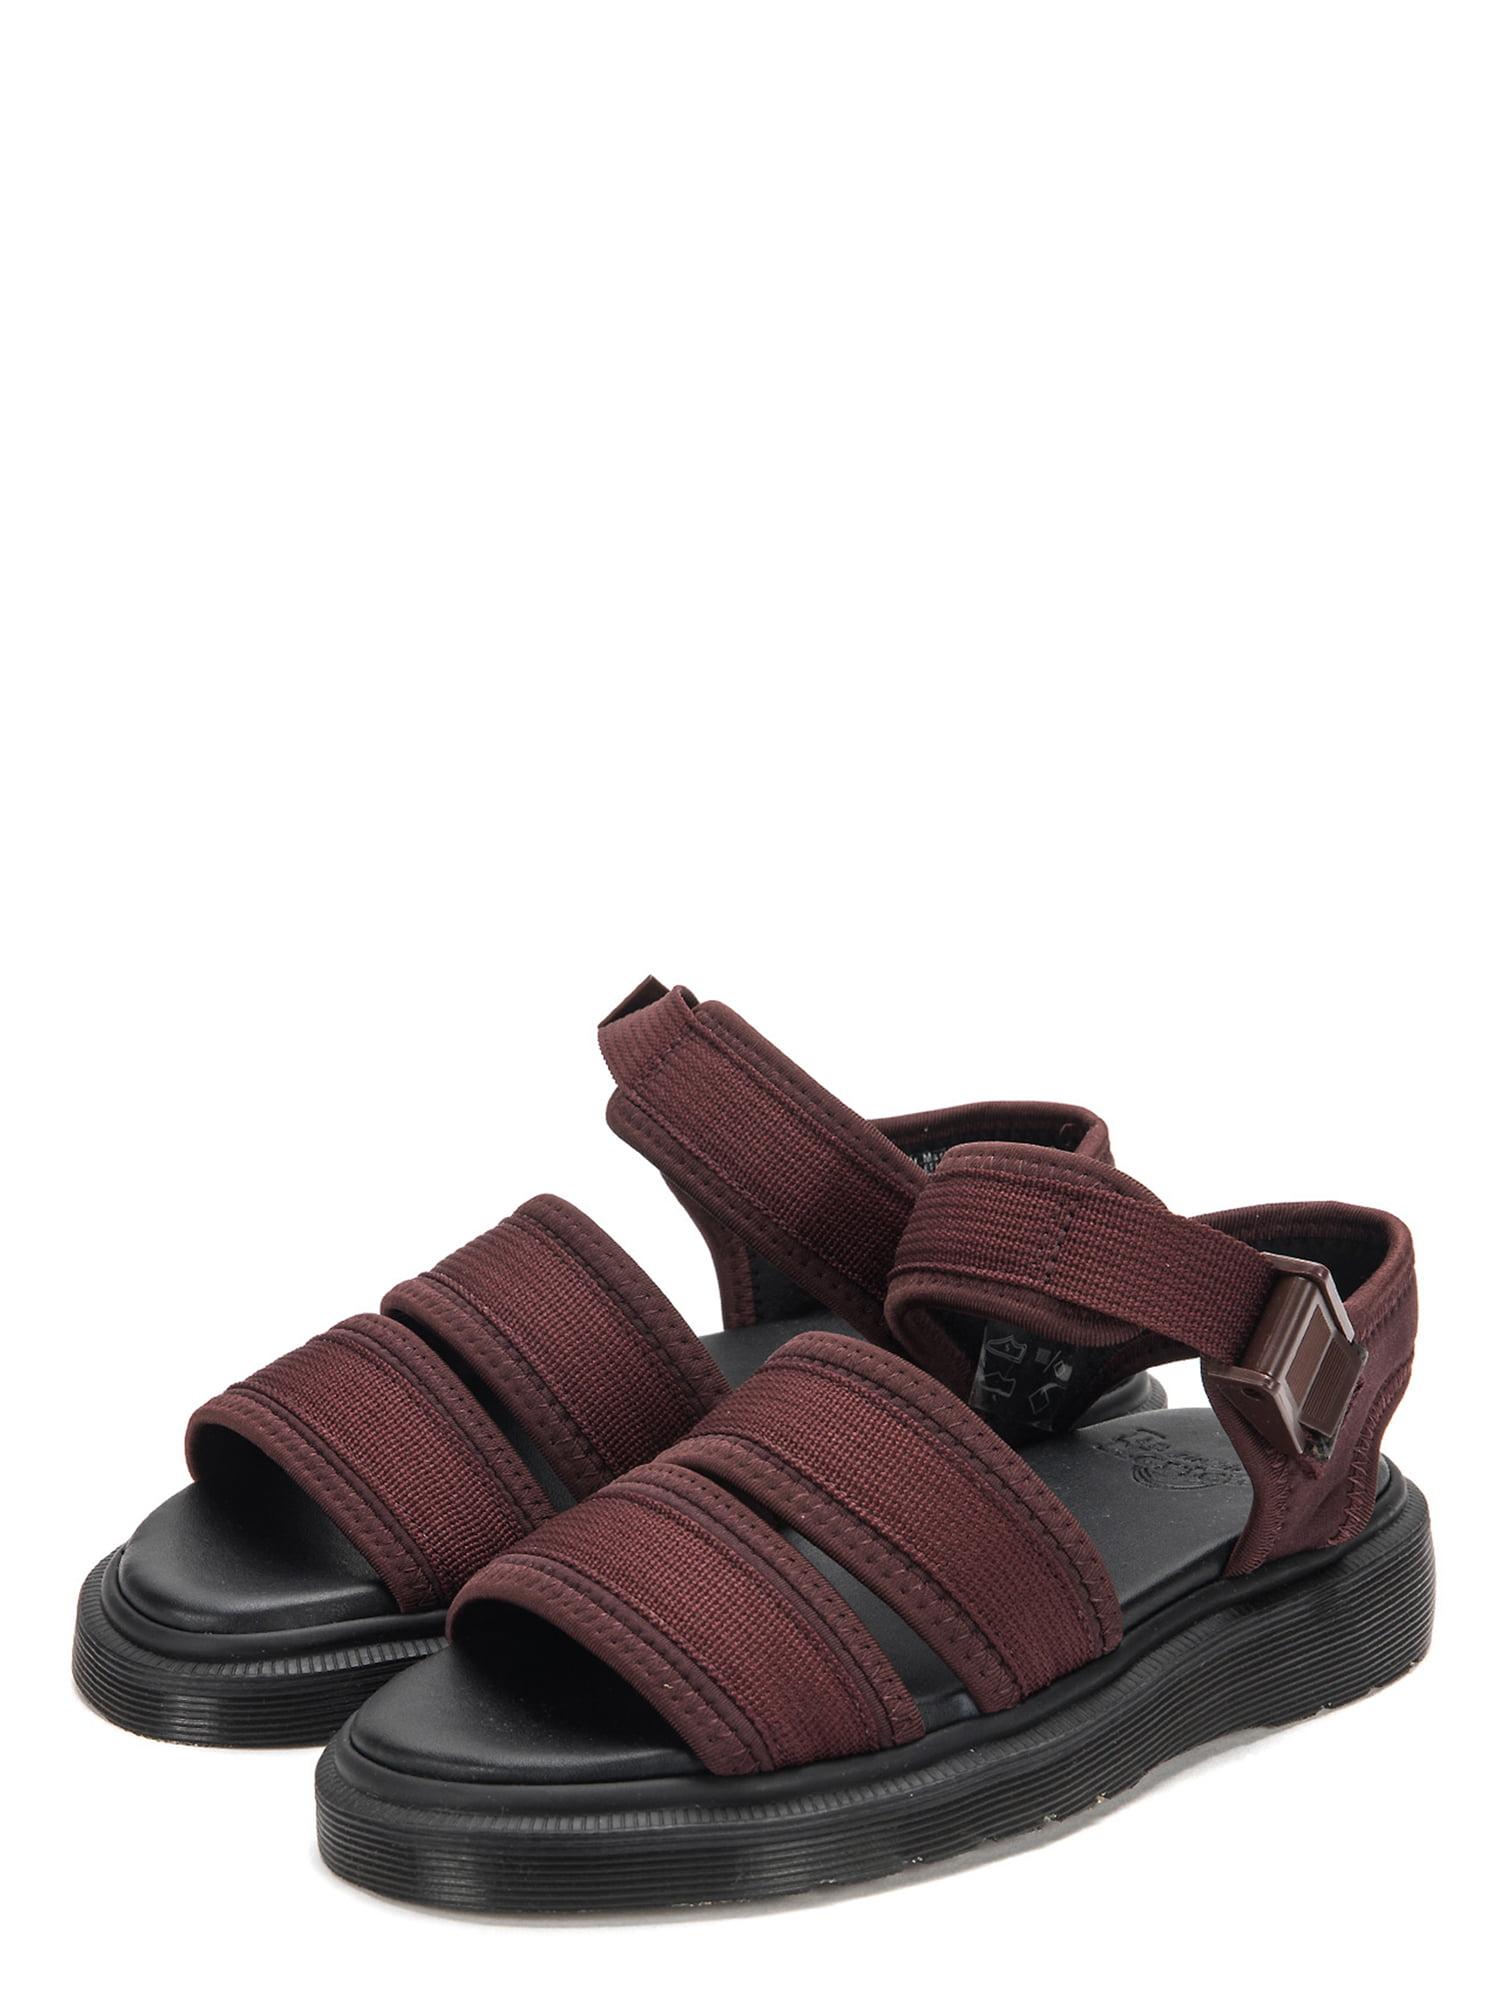 Dr. Martens Effra Two Strap Sandals 21136601 Oxblood by